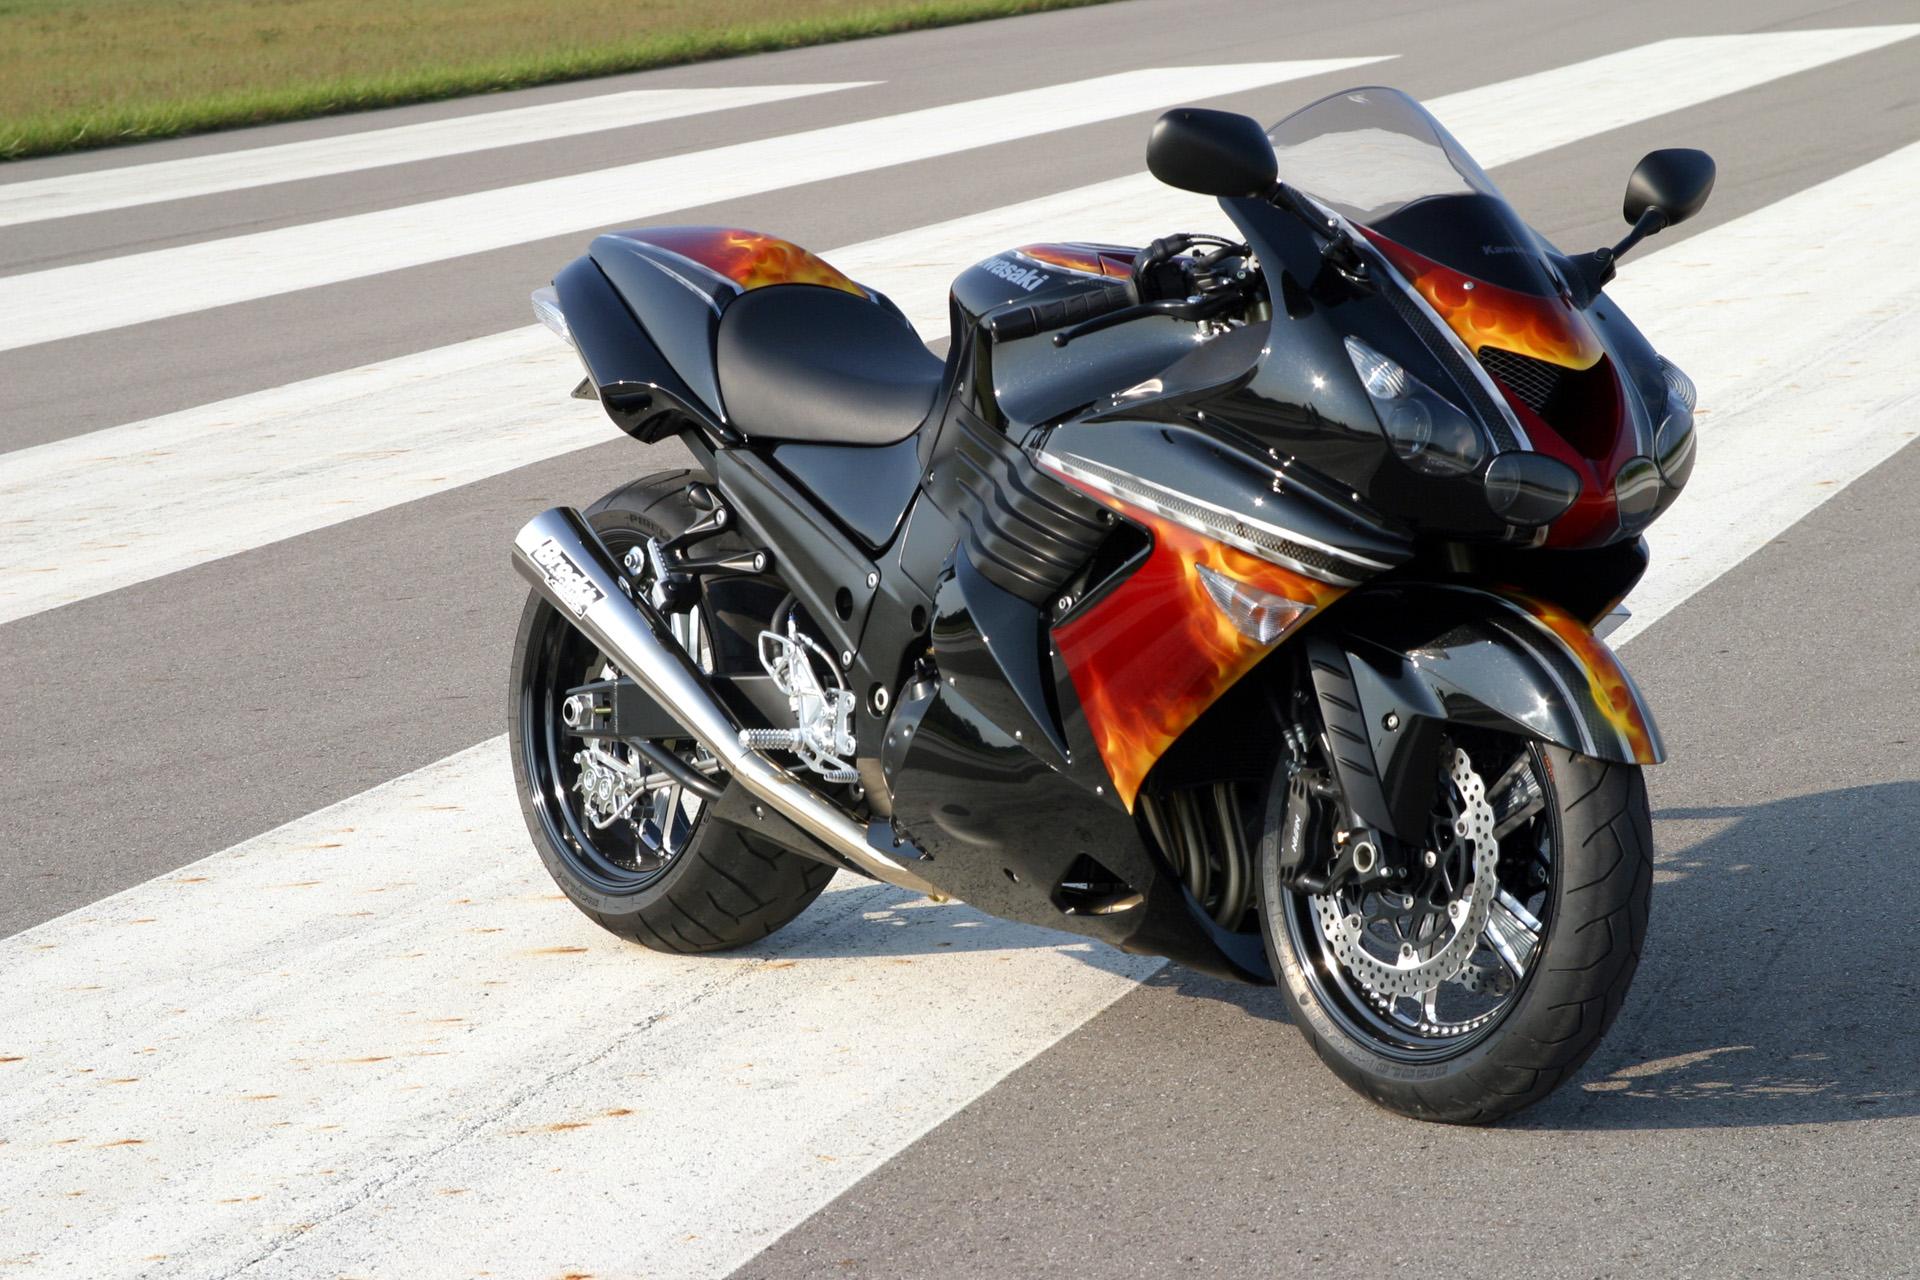 Самые крутые мотоциклы - Kawasaki Ninja ZX-14